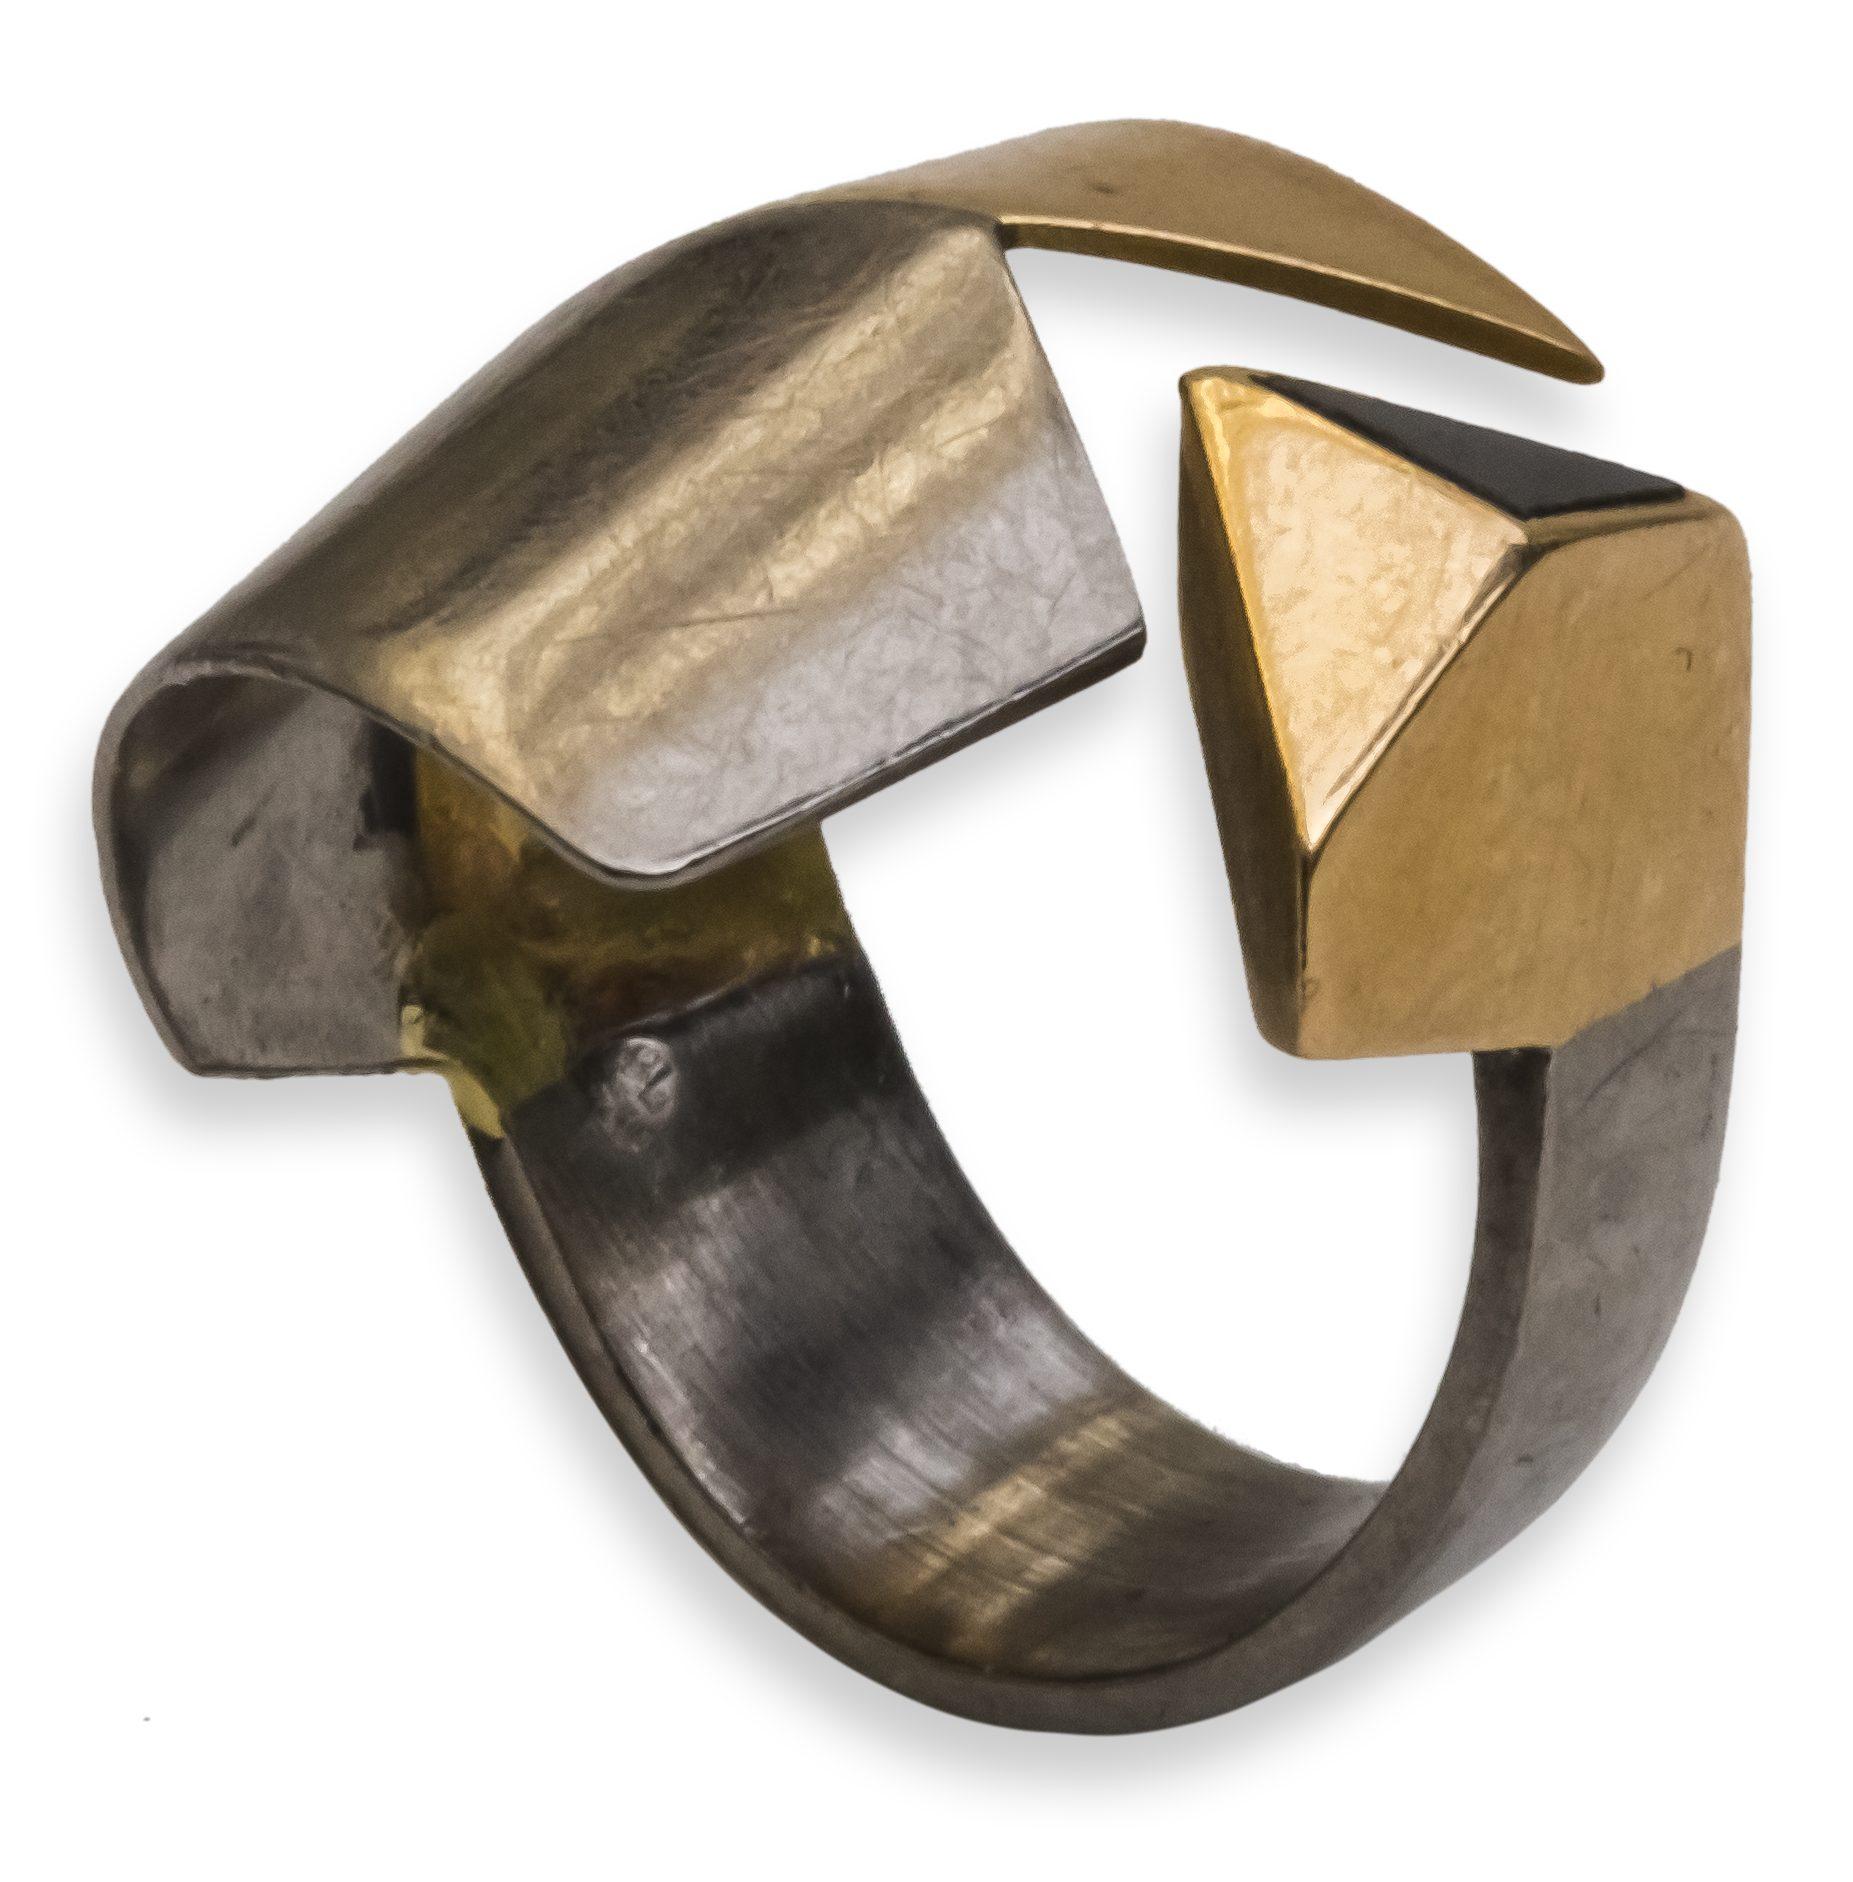 Klaus Ullrich, ring, 1987. Collectie Ida Boelen-van Gelder. Fotografie Aldo Smit©